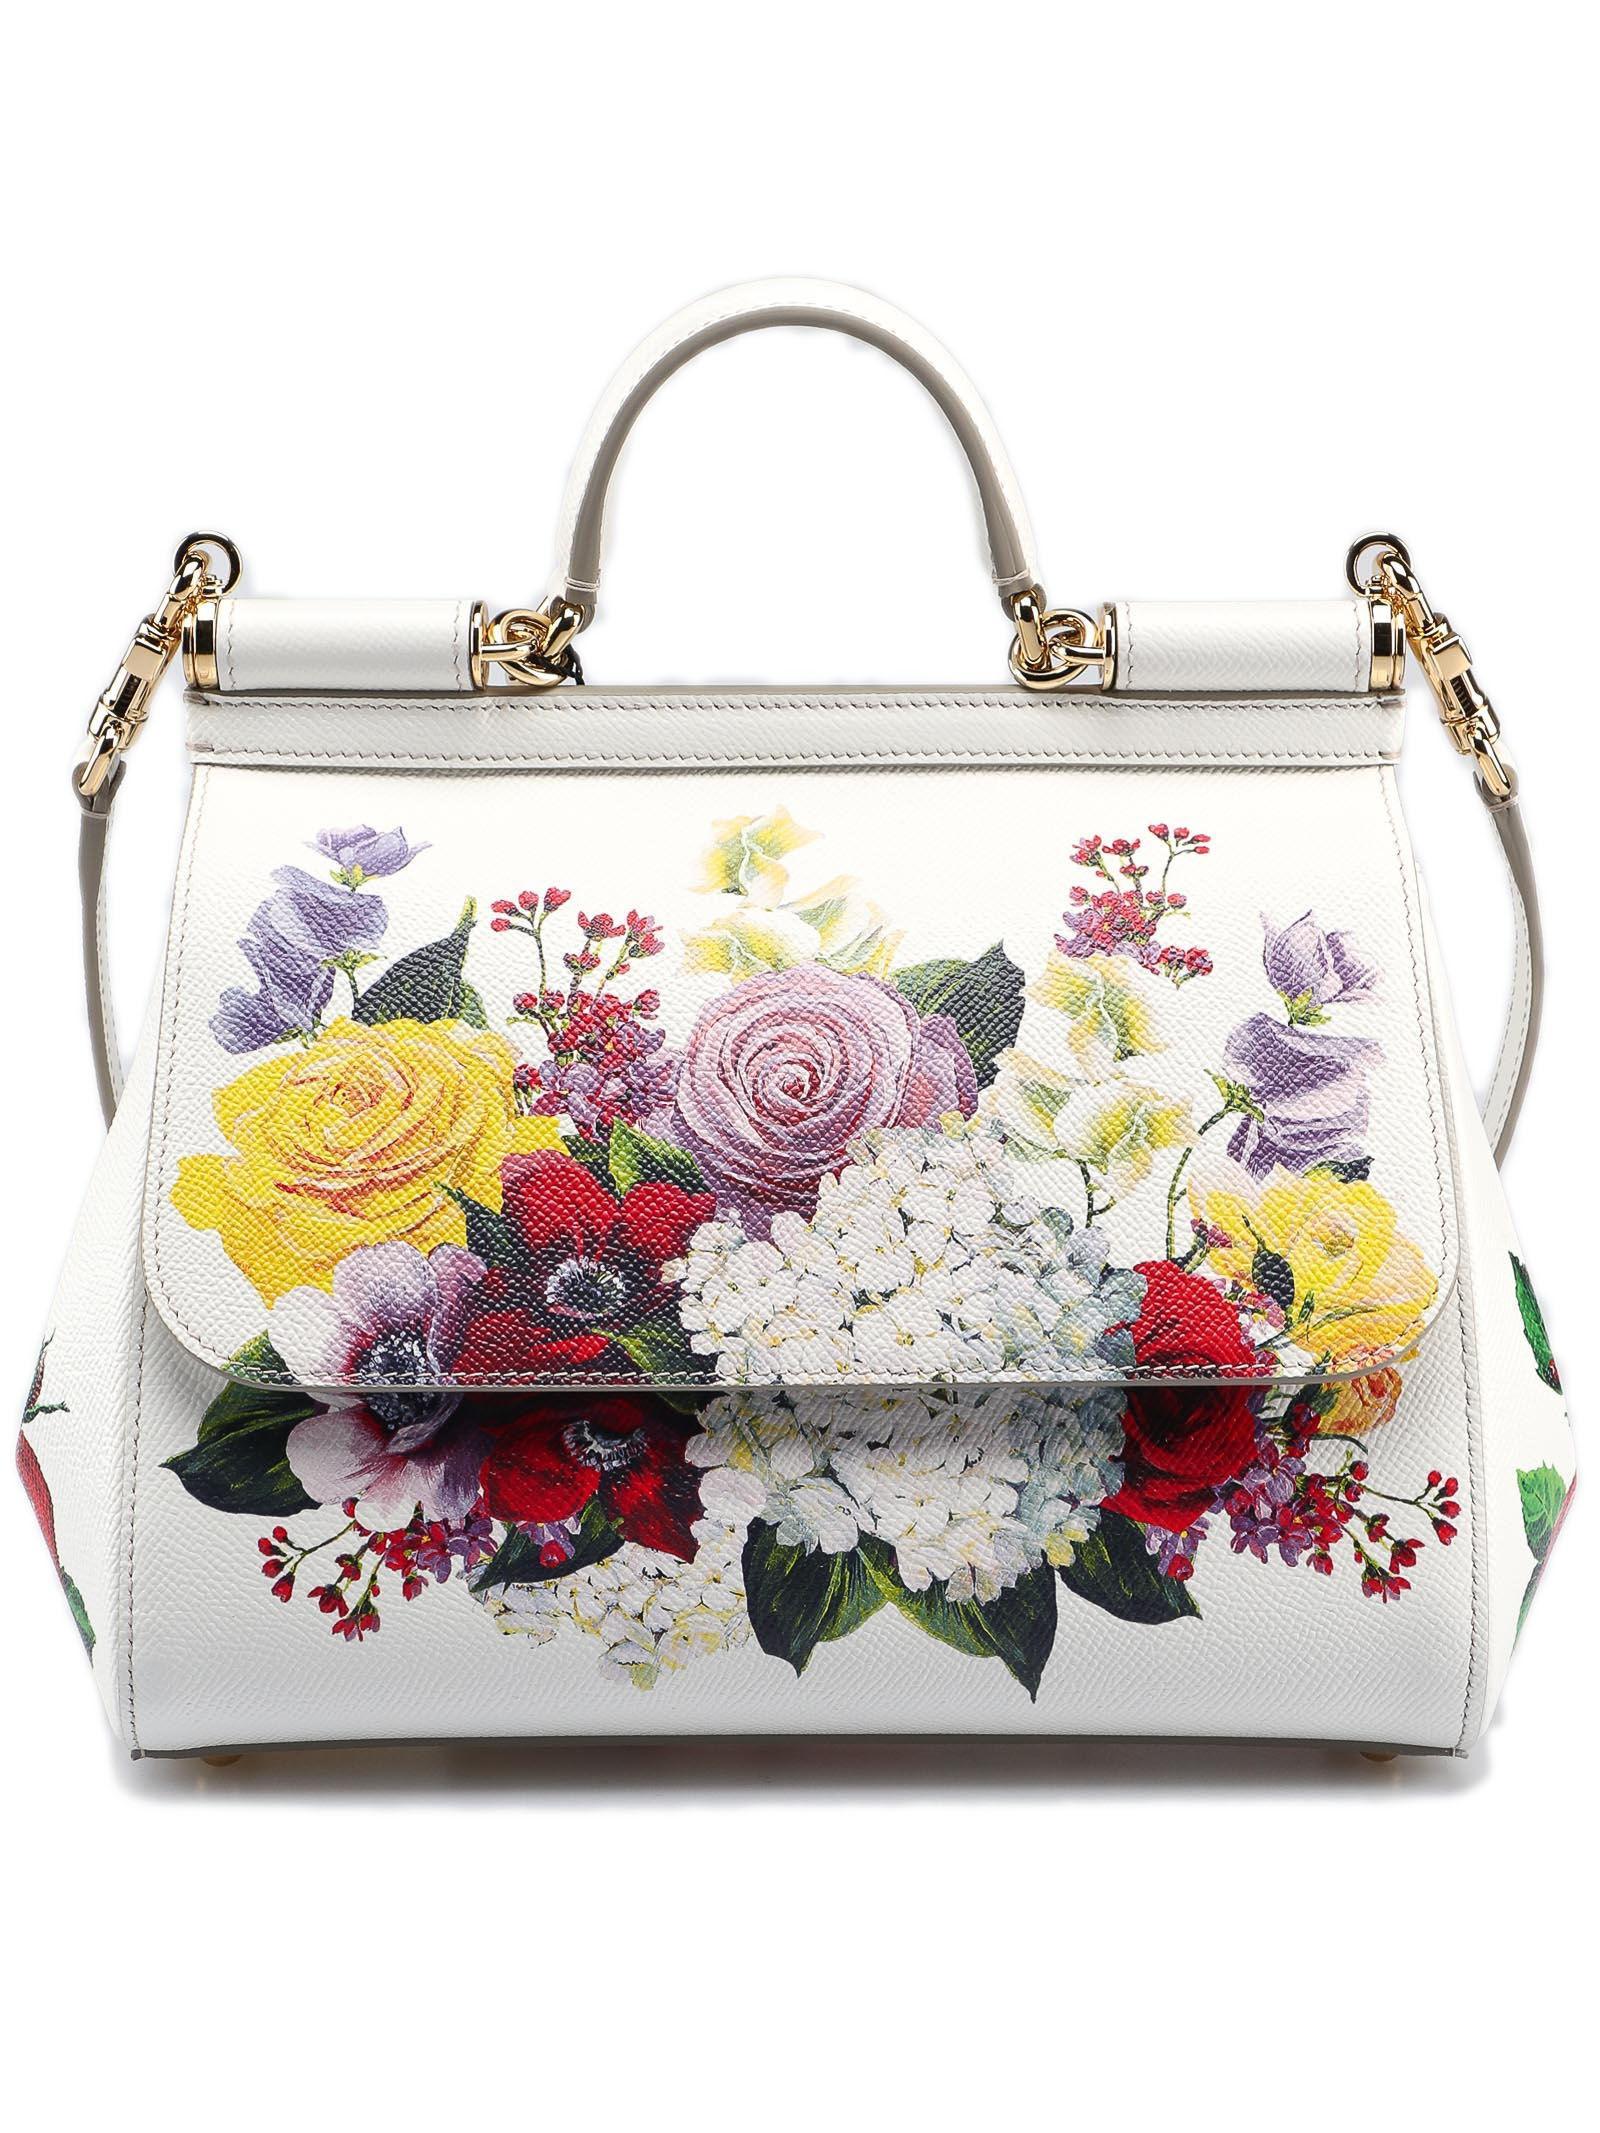 69417d7f6e91 Lyst - Dolce   Gabbana St.dauphine Handbag